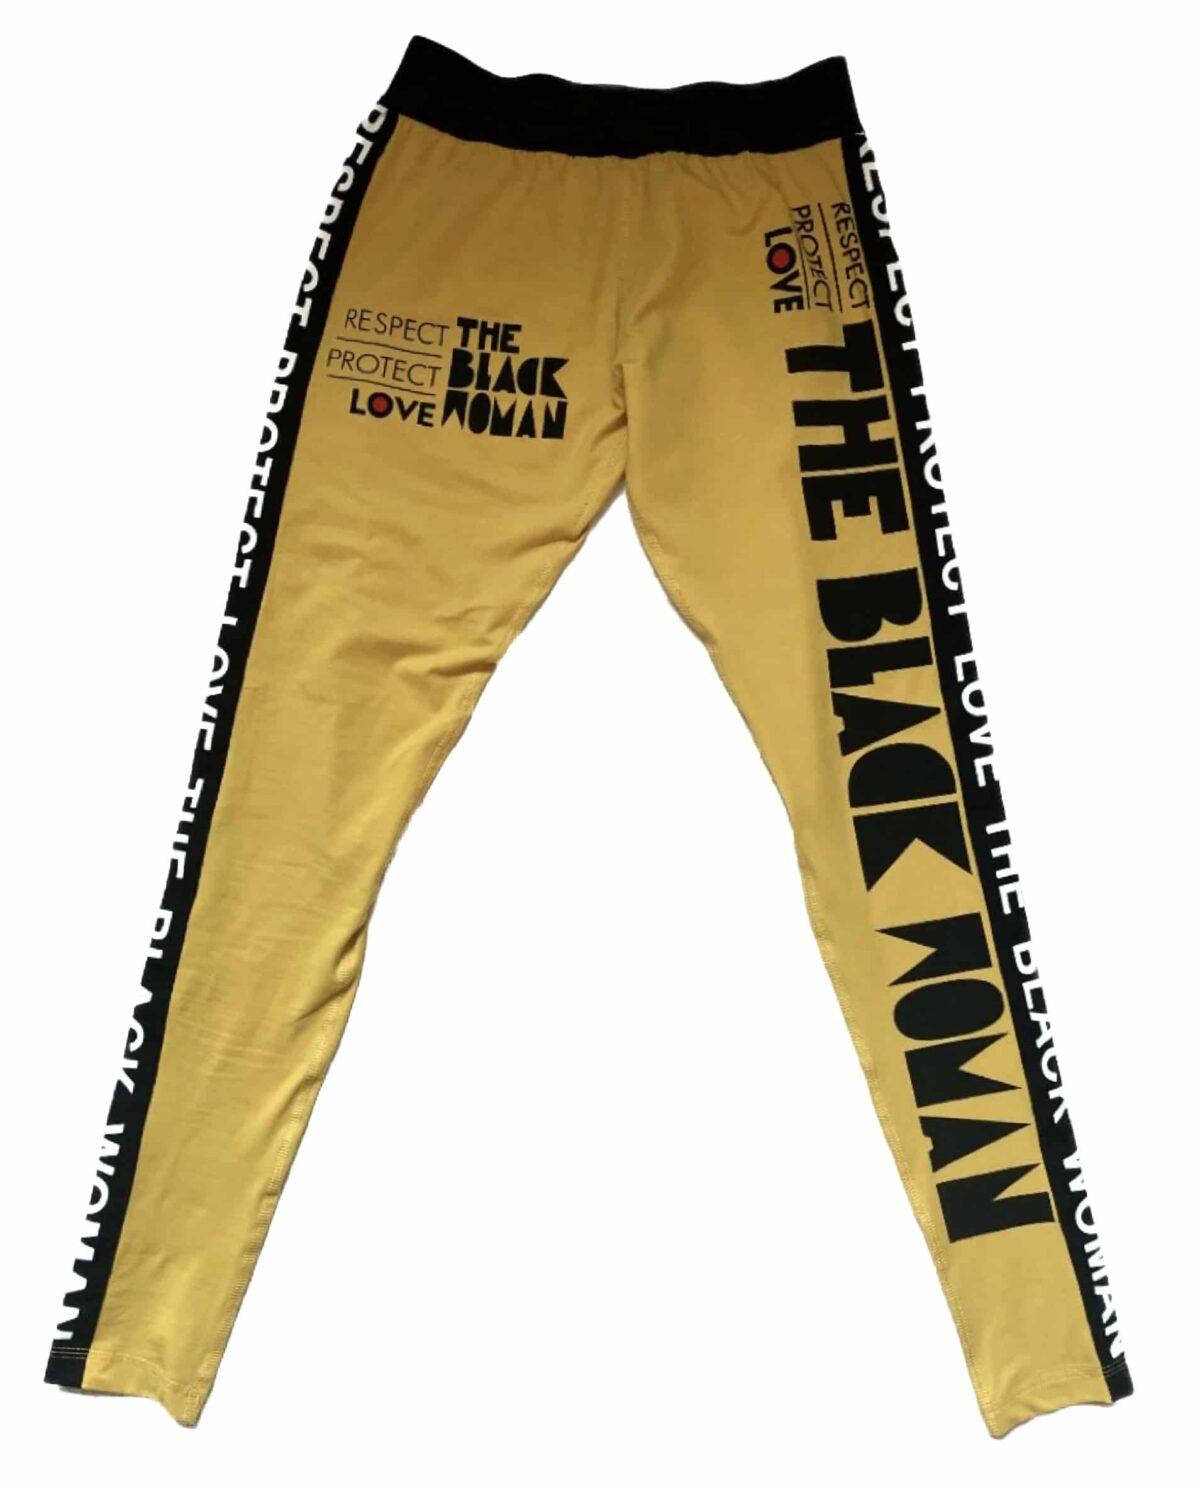 Respect Protect Love The Black Woman® Spandex Leggings Pants HGC Apparel